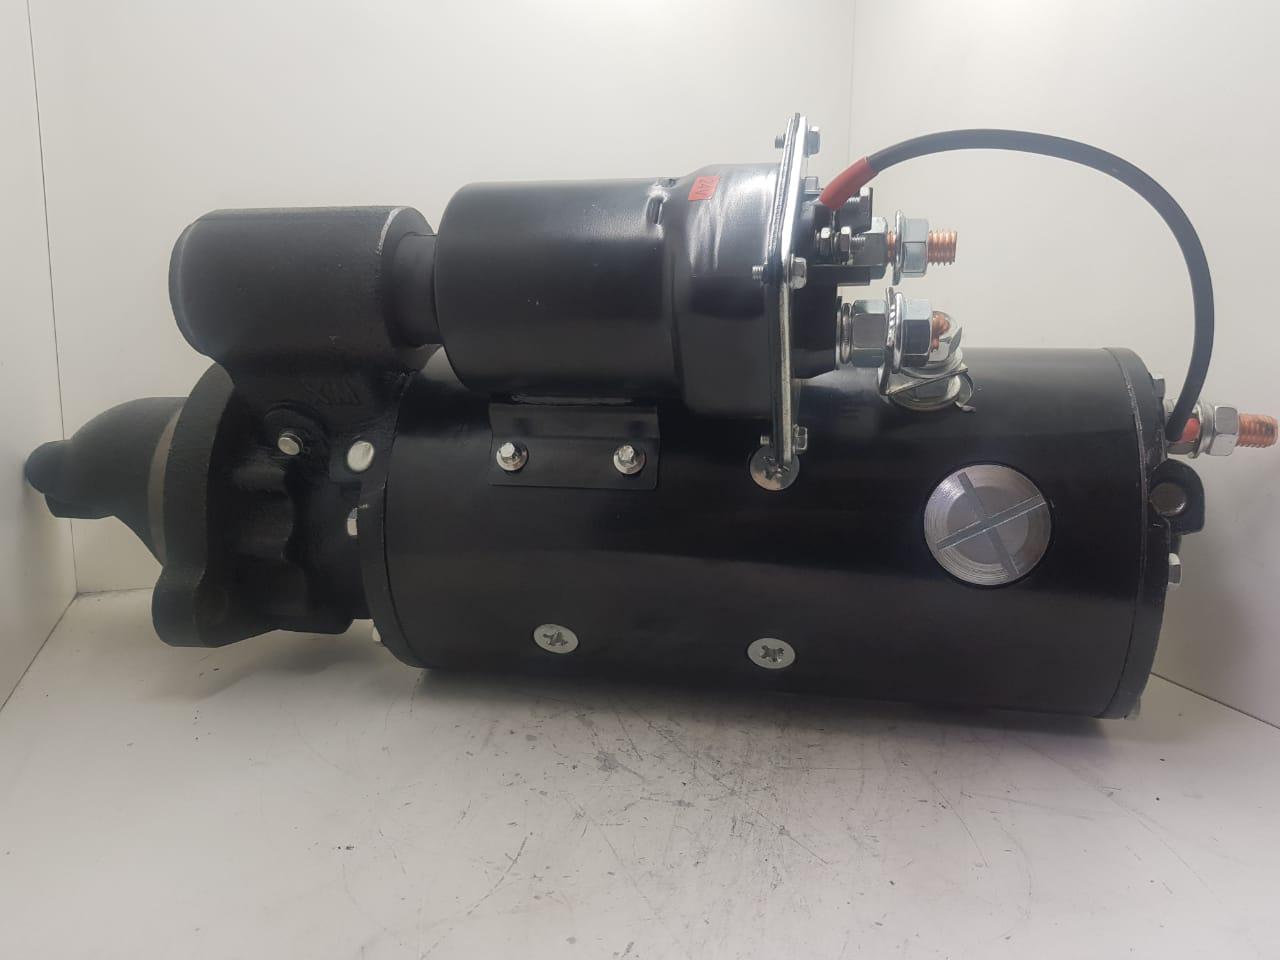 Motor Partida Arranque Delco 50MT 24V 11 dentes Caterpillar 10479339 245 330C 346 631 641 660 666 768 769 772 773 824 825 826 D08  AEC17150